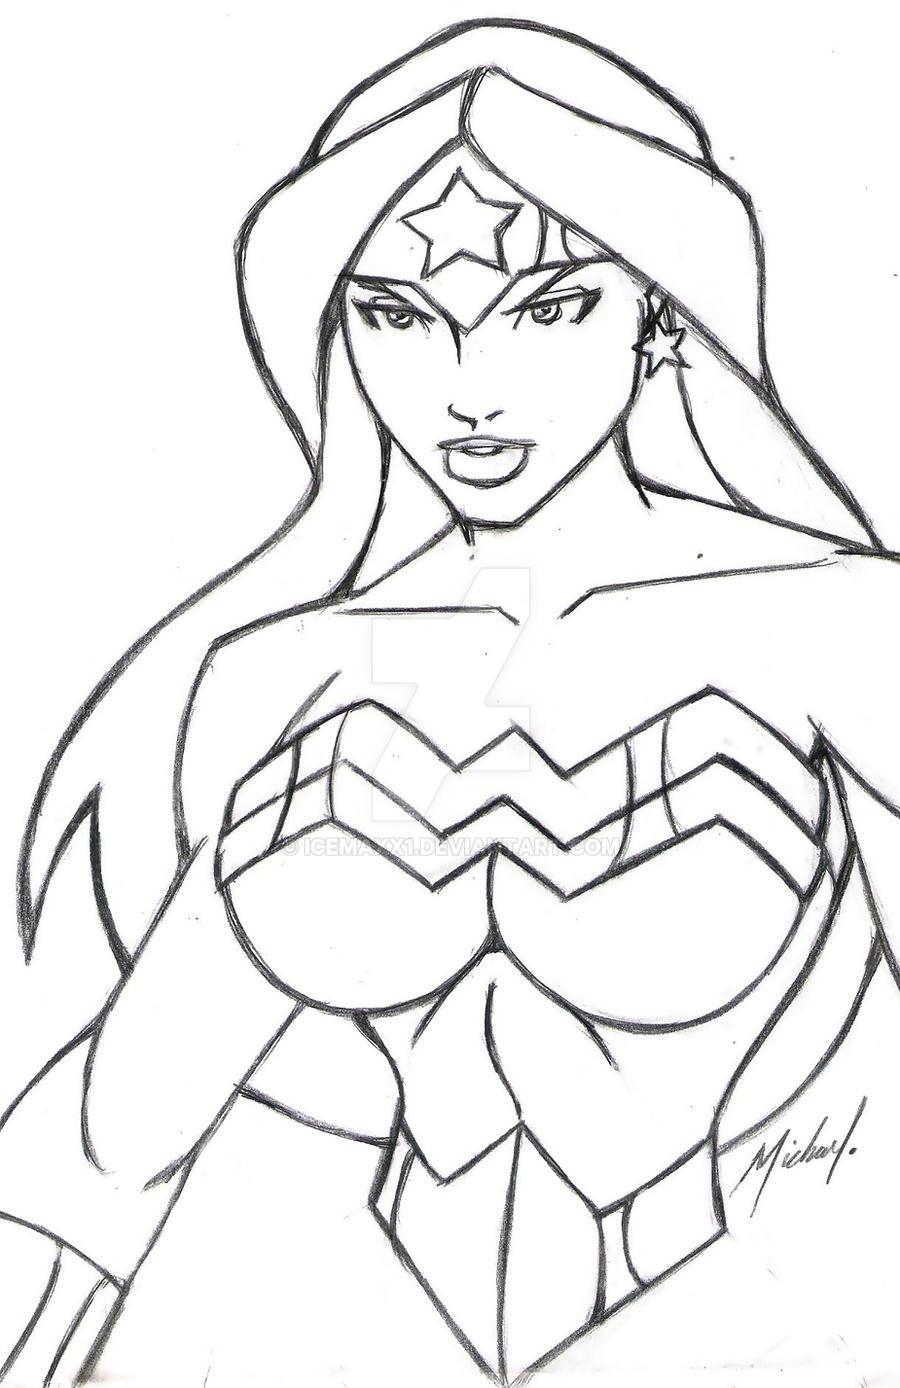 WONDER WOMAN LINE ART by icemaxx1